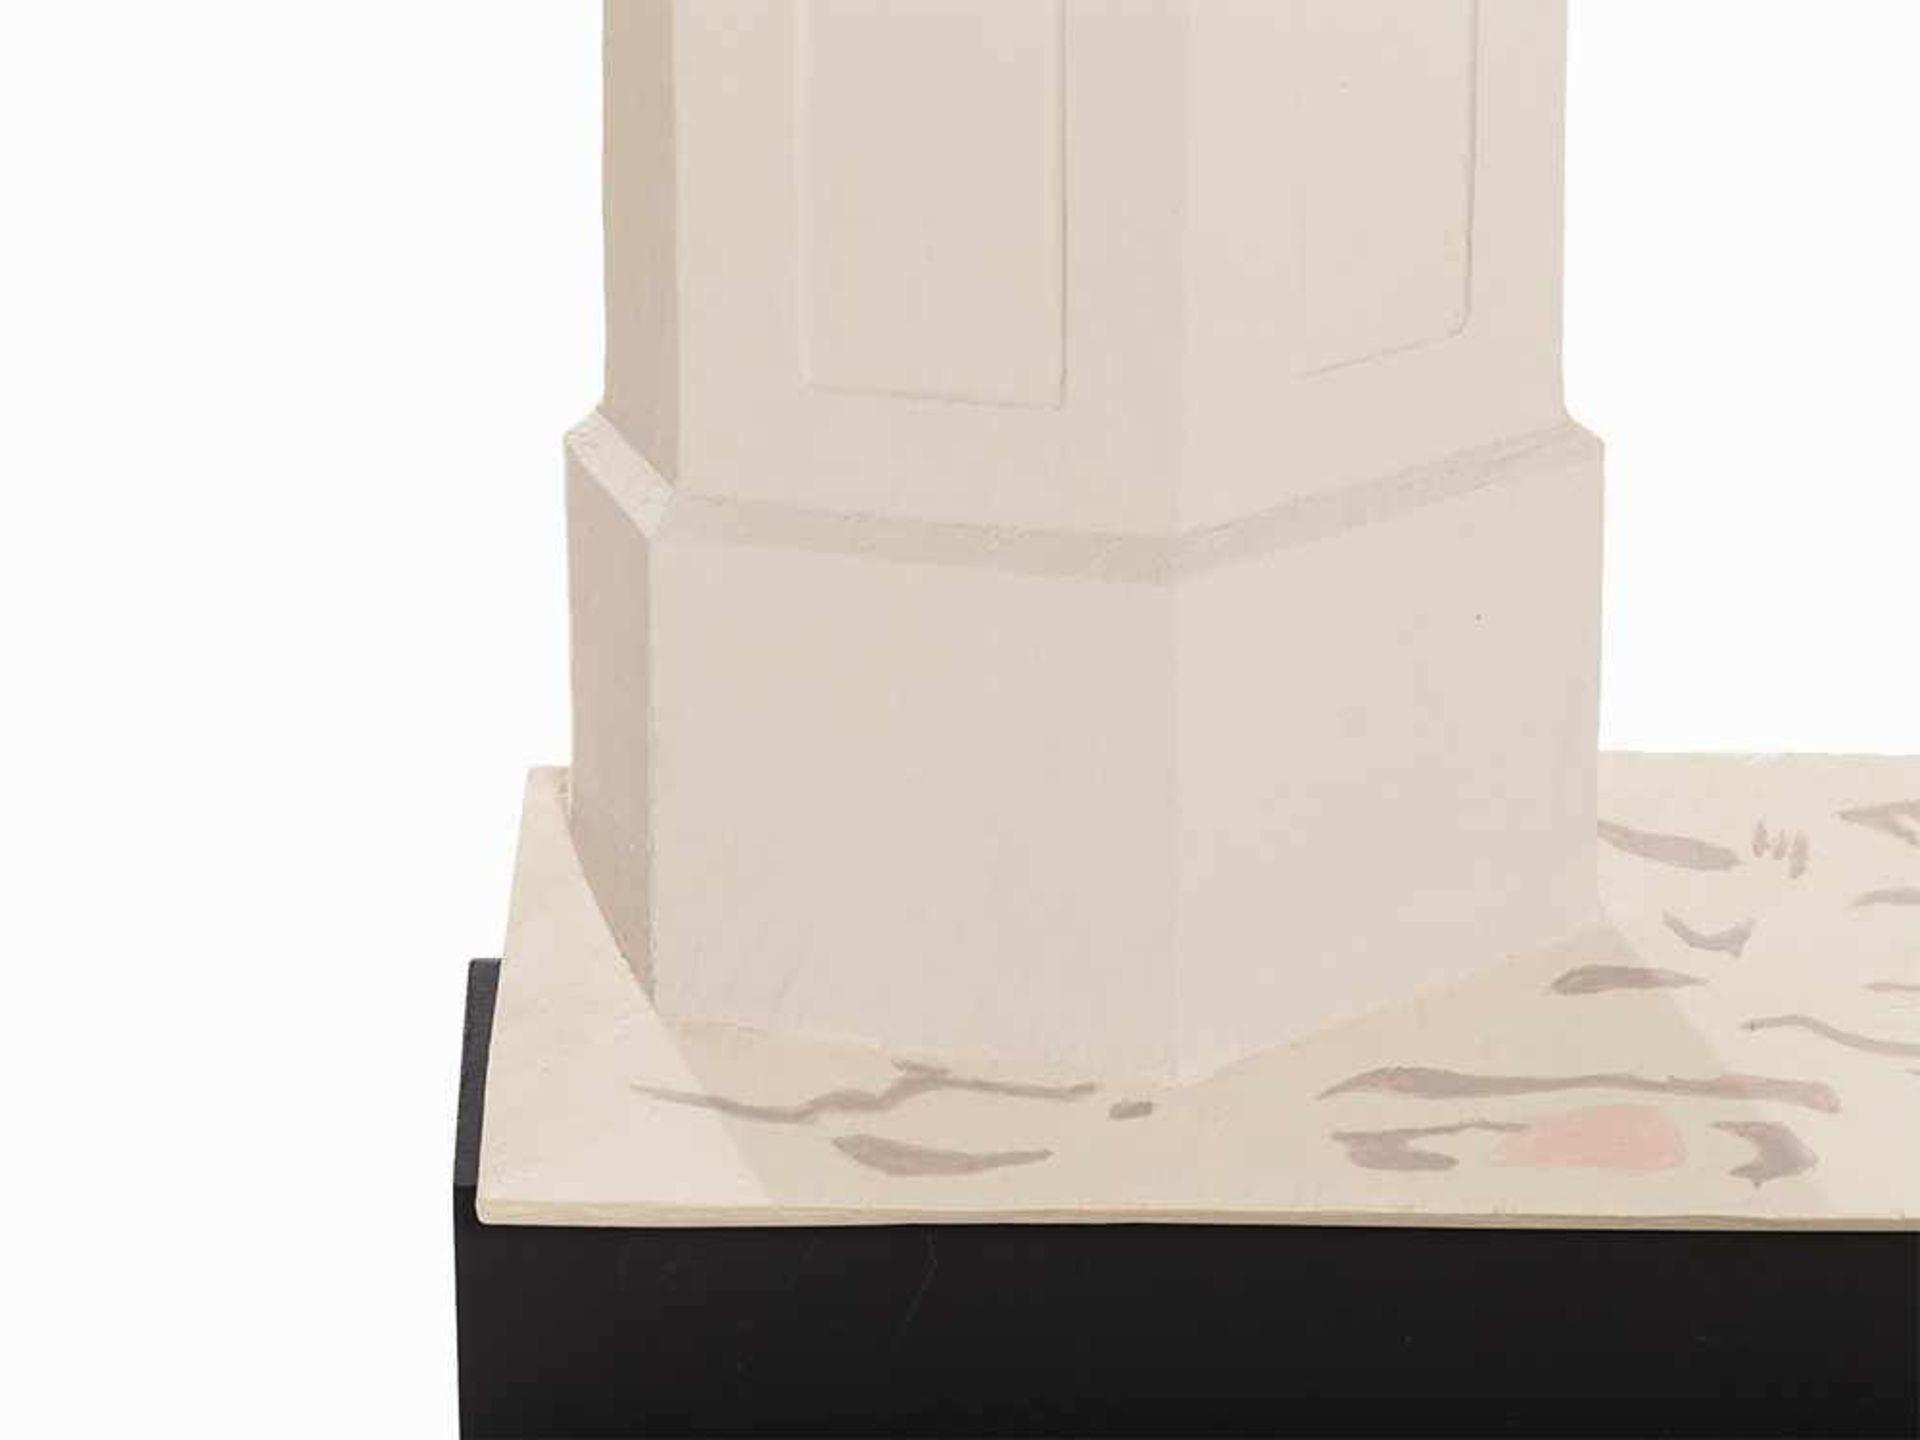 Los 90 - Albert Ricken (geb. 1970), Felicitas, Gipsskulptur, 2007 Gips, partiell farbig gefasst,